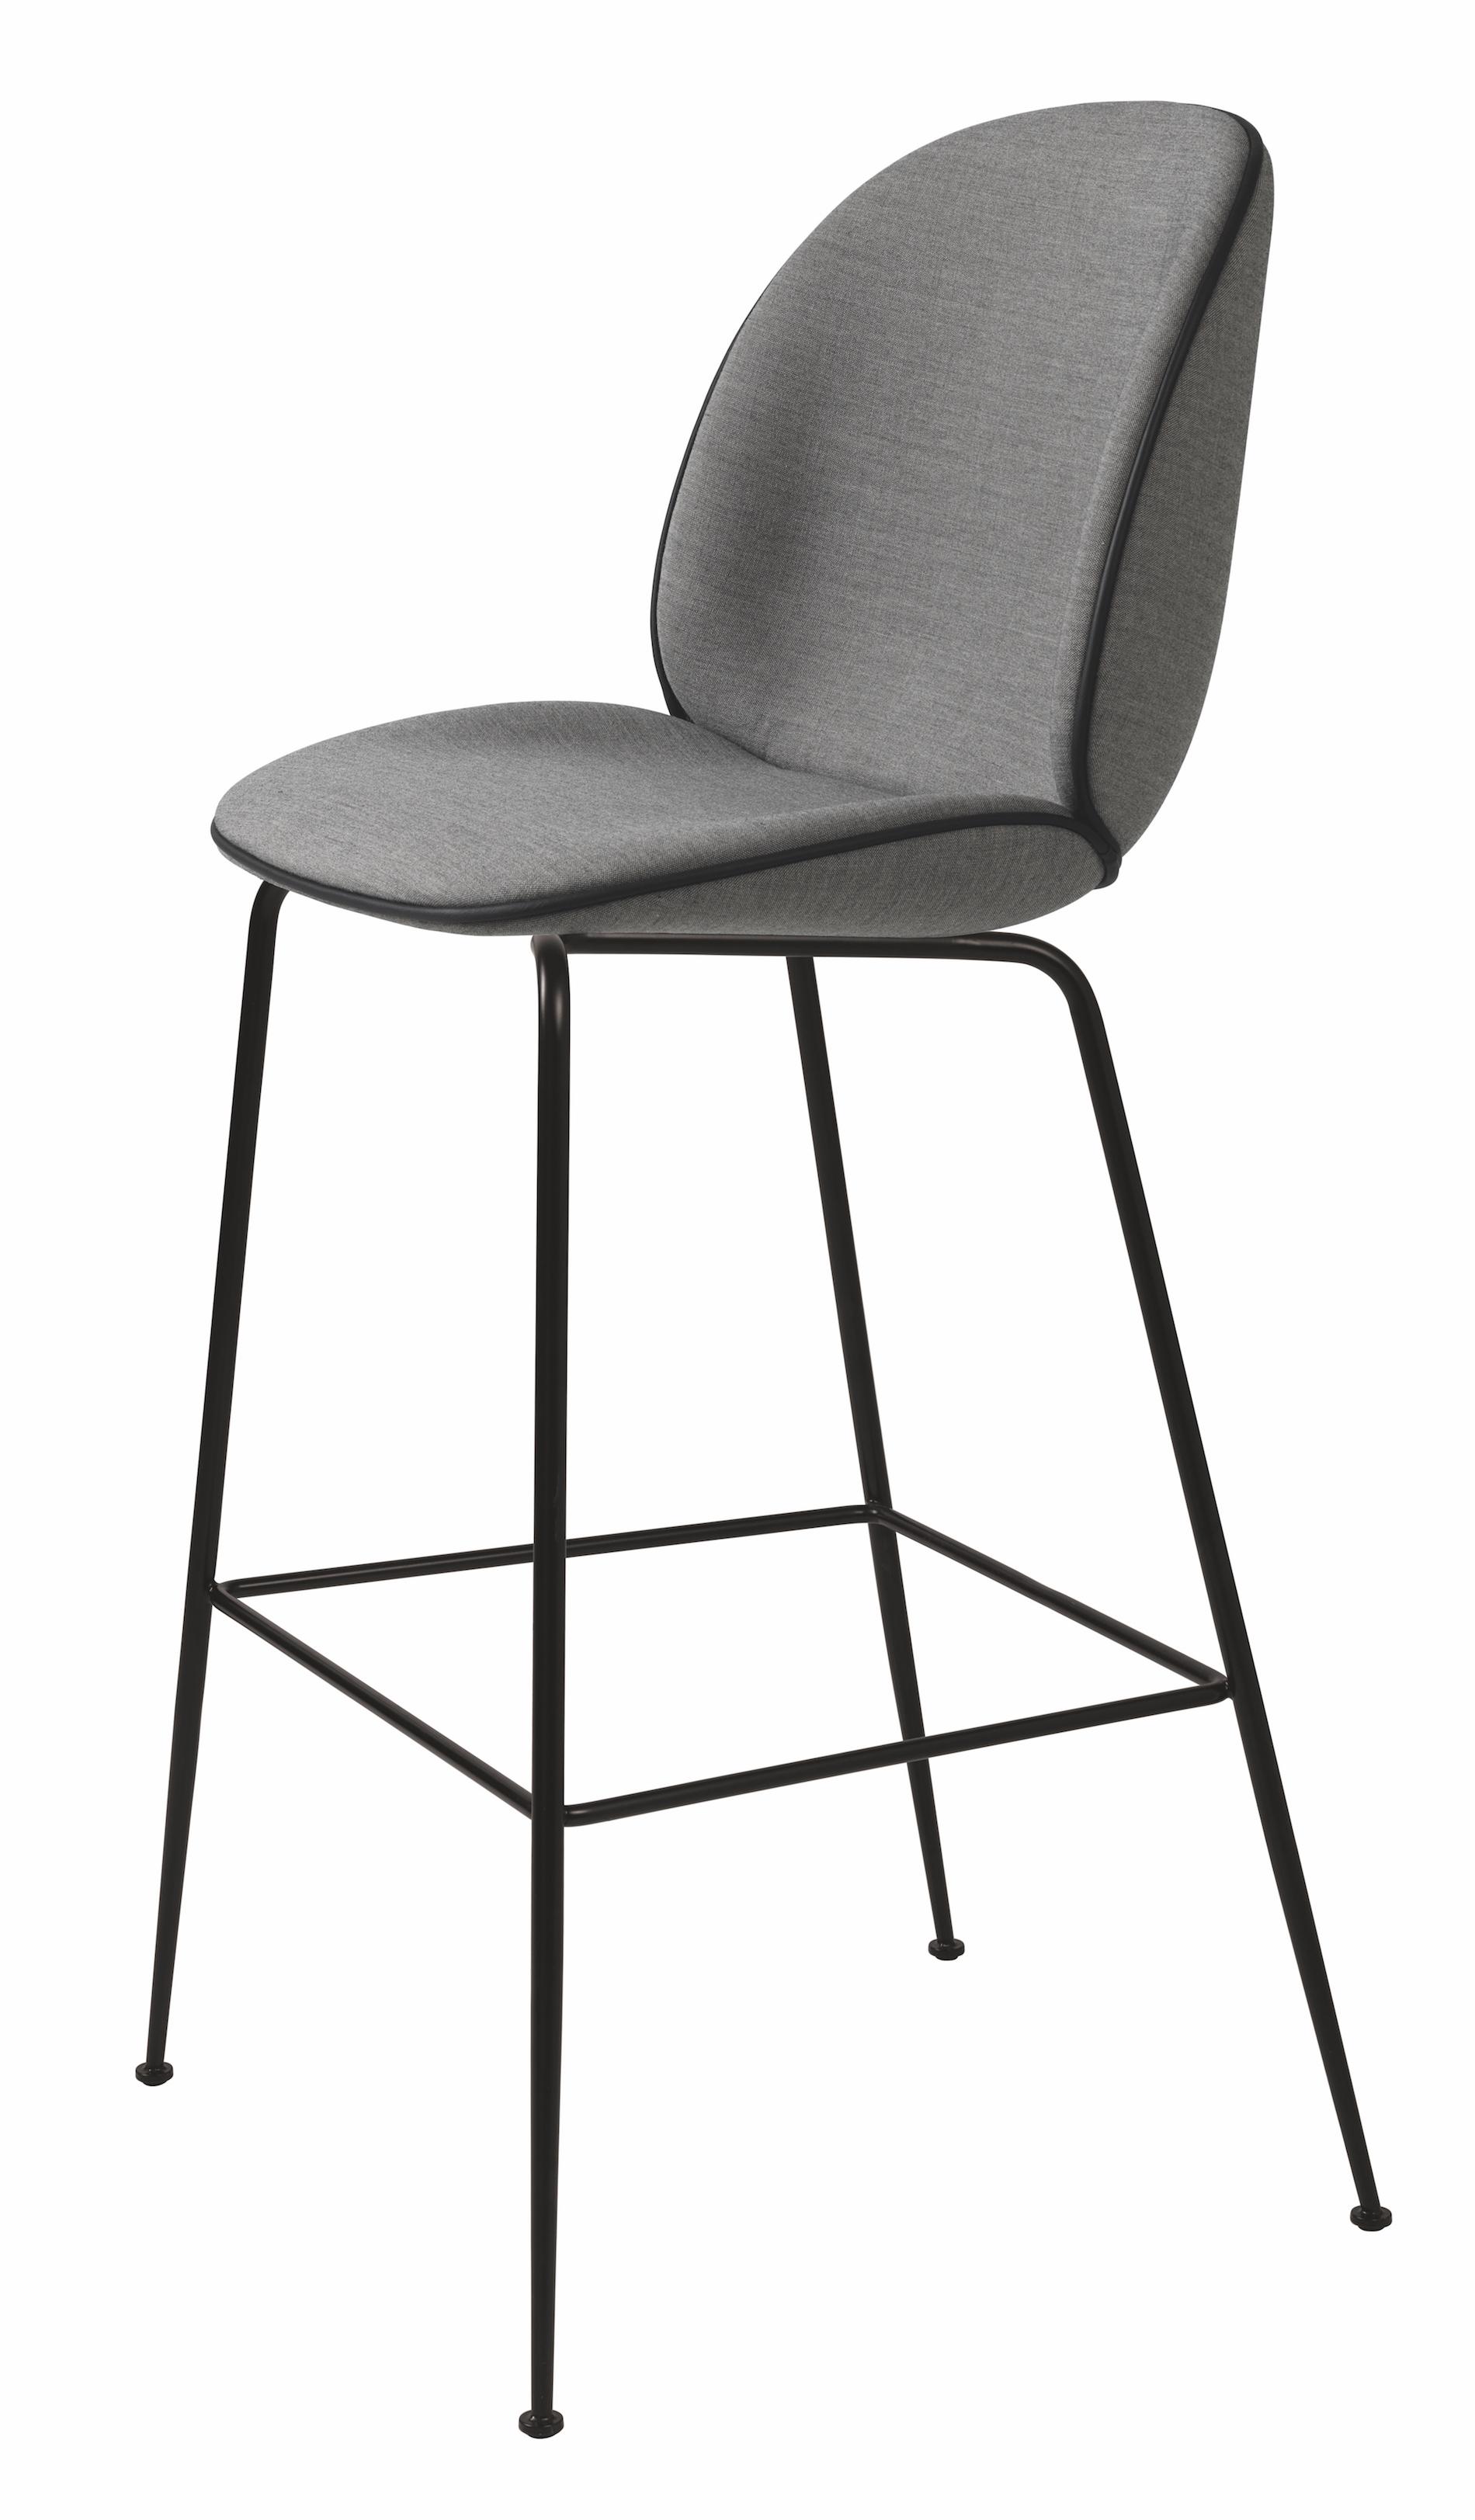 Gubi Beetle Bar Chair design GamFratesi : Beetle20Stool75Remix20colour2014320piping20Black20leatherFront mr from www.scandinavia-design.fr size 1900 x 3246 jpeg 1176kB